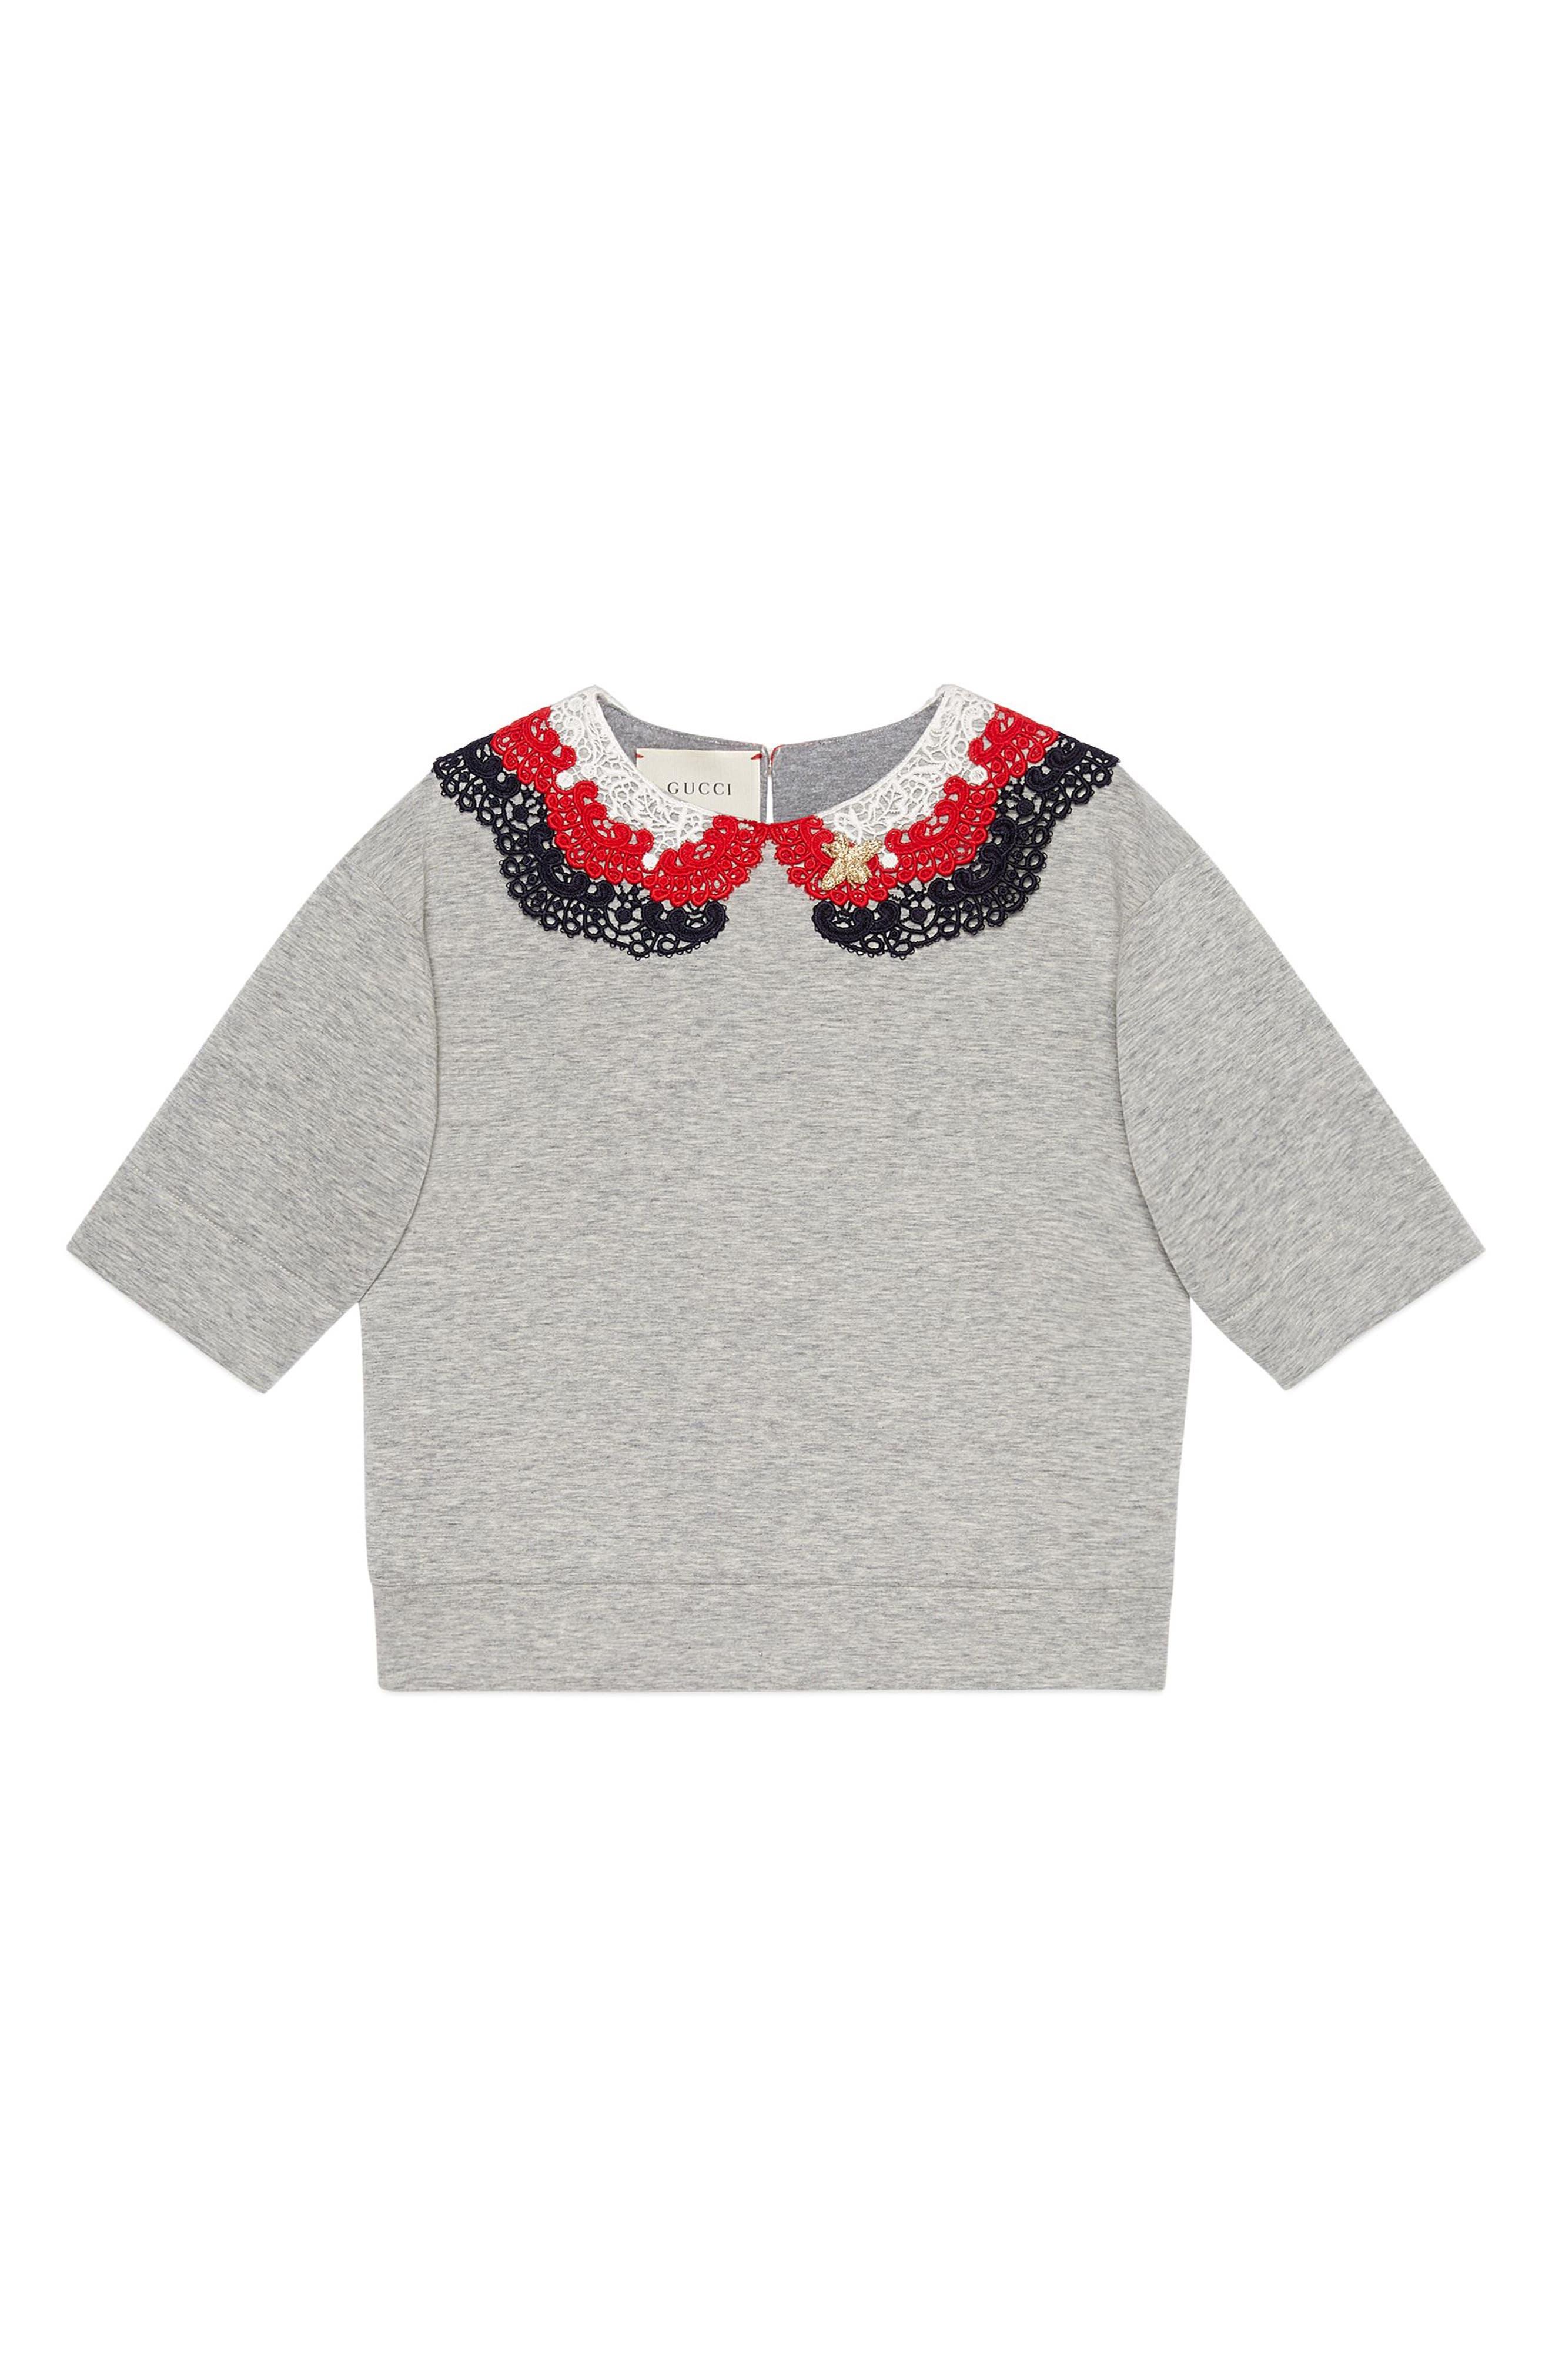 Sweatshirt,                             Main thumbnail 1, color,                             BLACK/ GREY